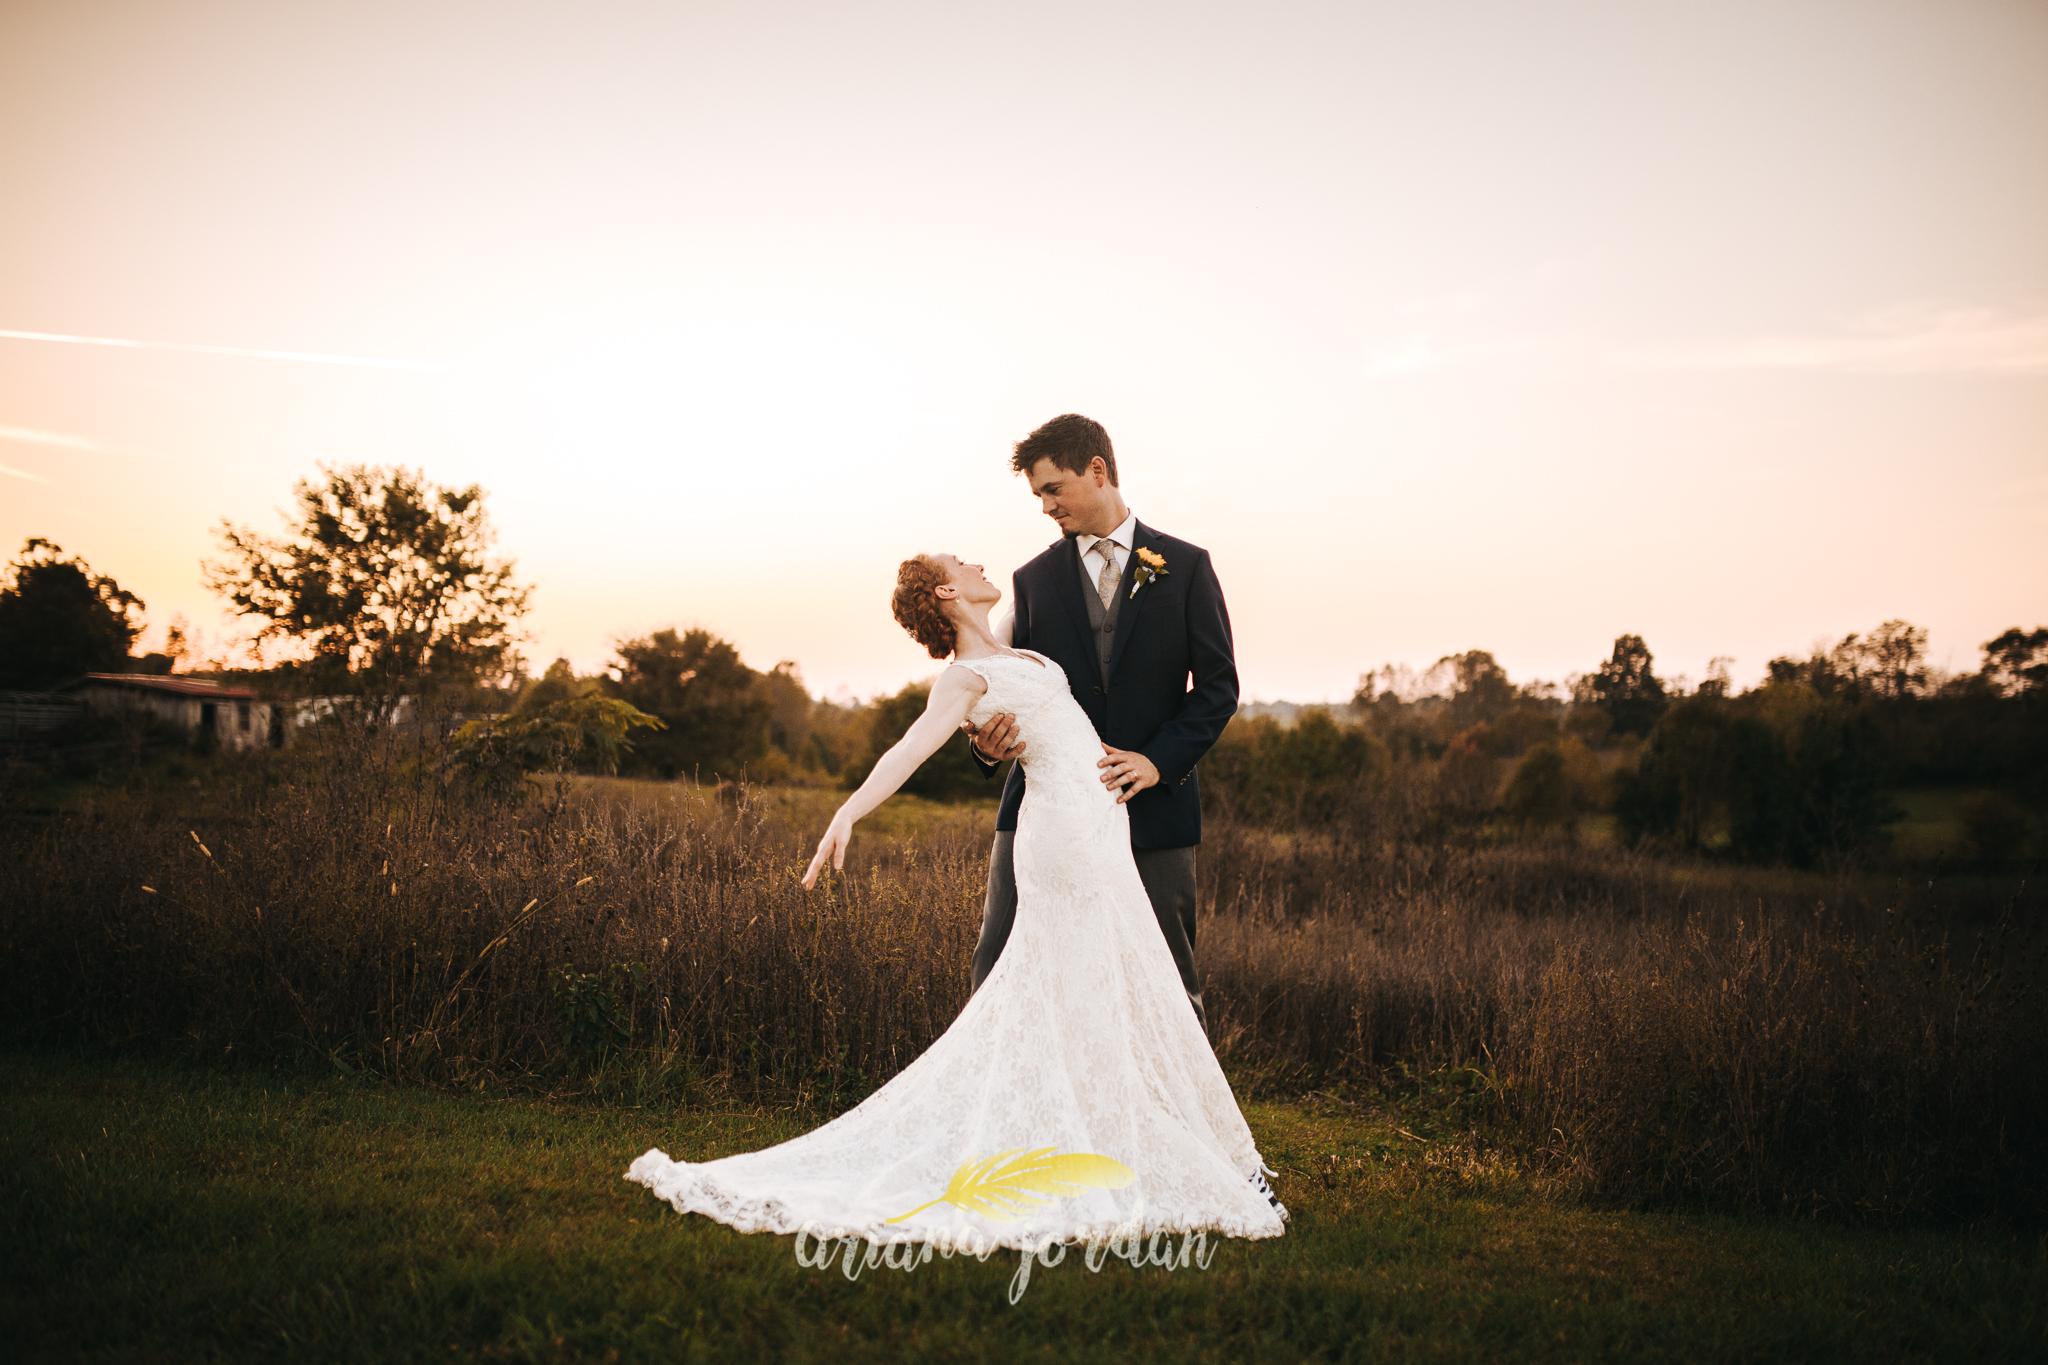 134 Ariana Jordan Photography -Moonlight Fields Lexington Ky Wedding Photographer 2095.jpg